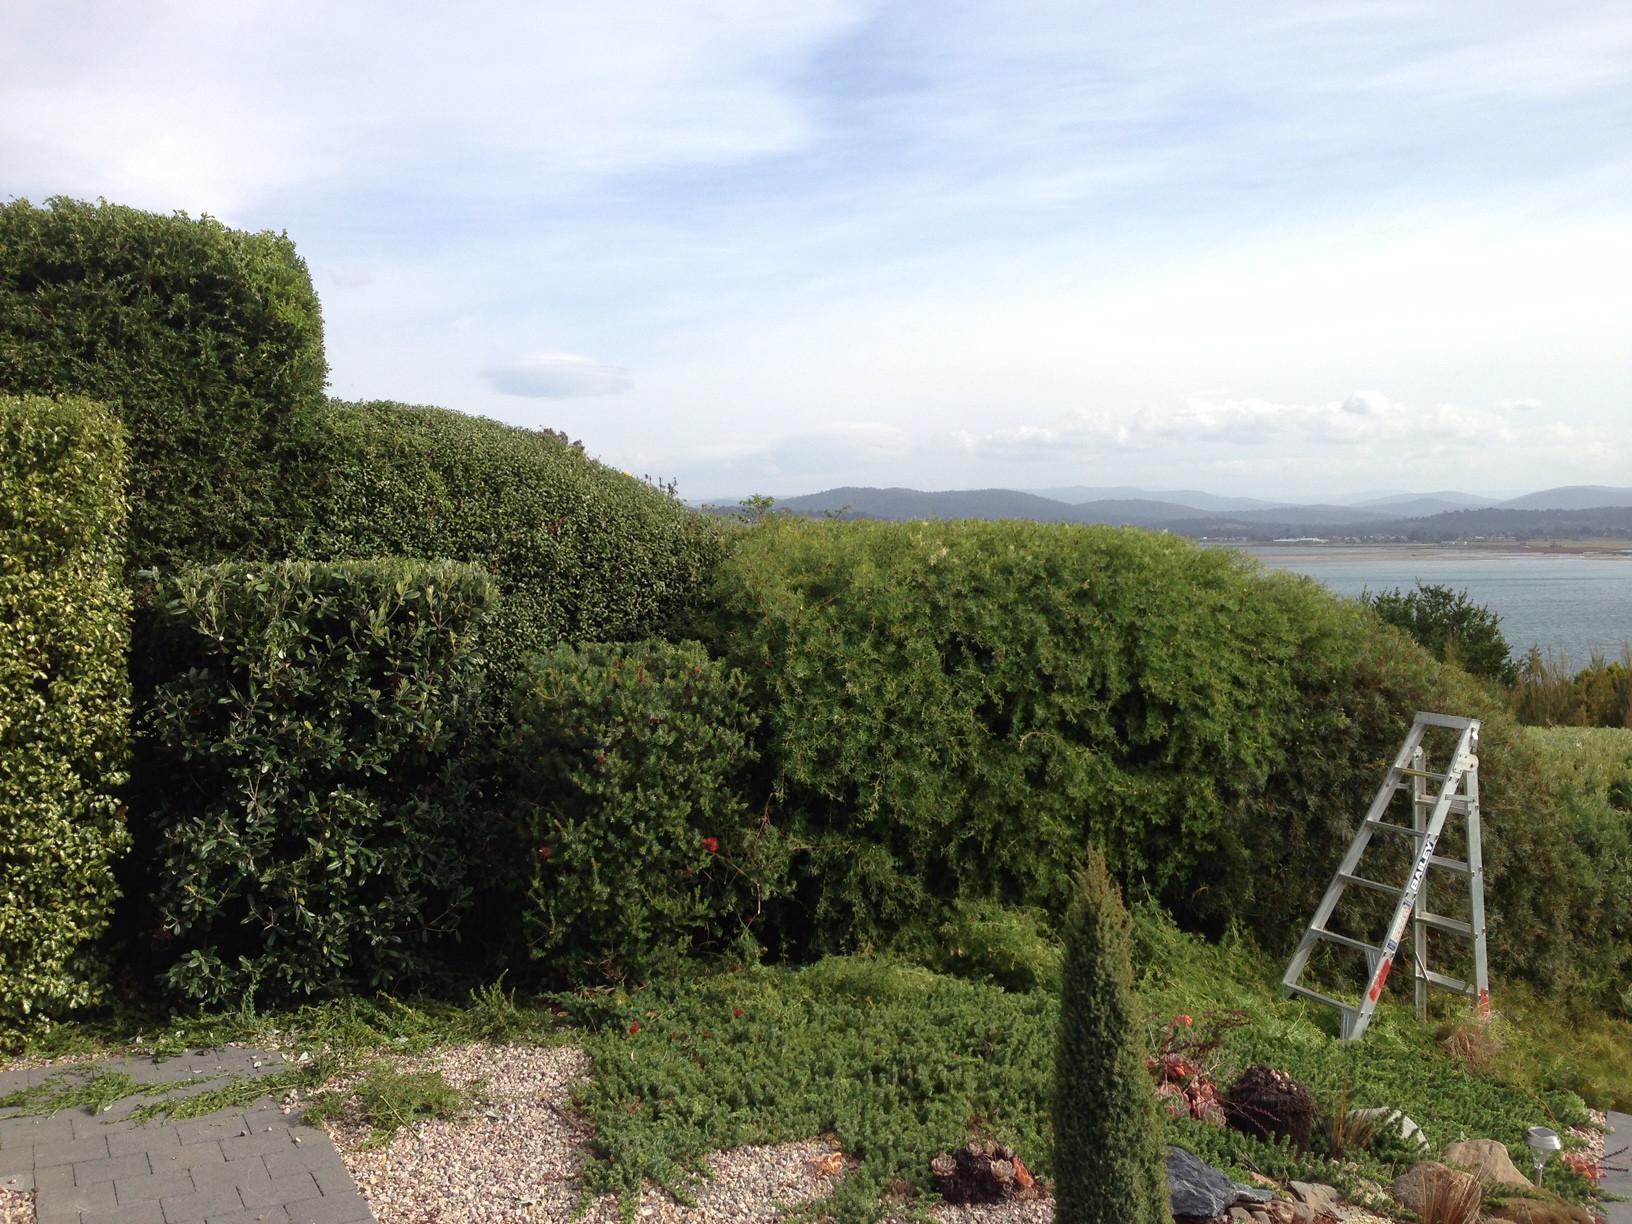 Garden Maintenance - Pruning